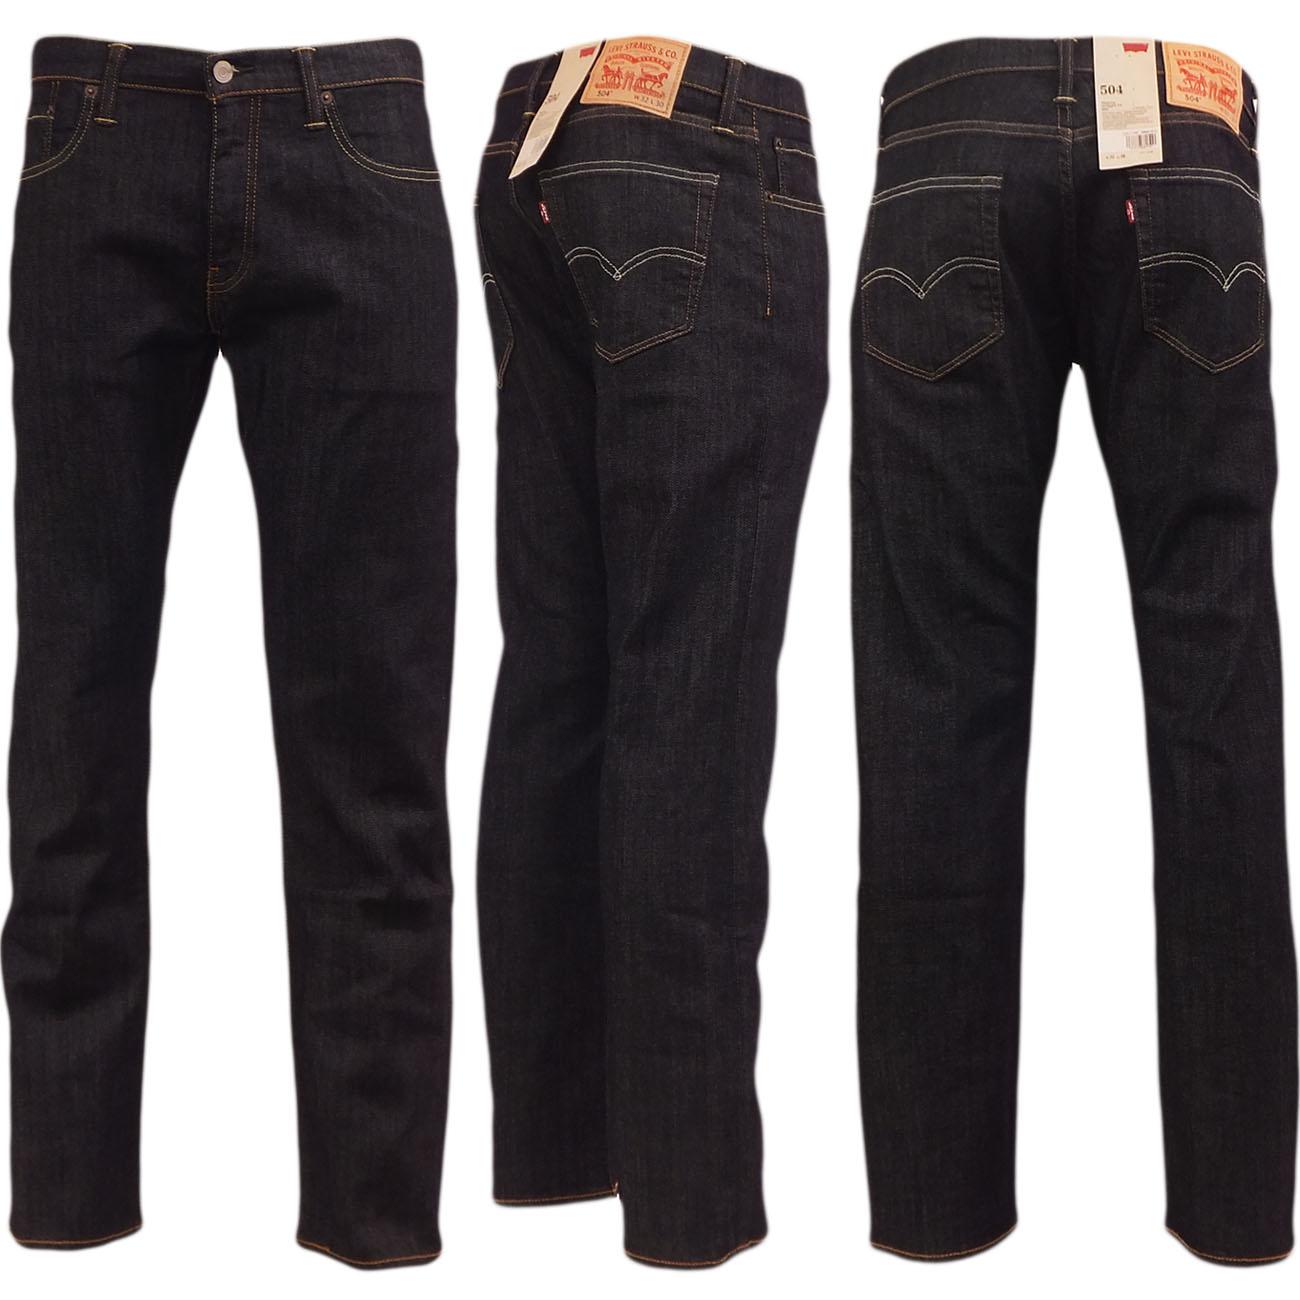 Levi 504 Regular Straight Fit Jean Leviu0026#39;s Denim Jeans u0026#39;High Defu0026#39; 30 32 34 36 38 | eBay